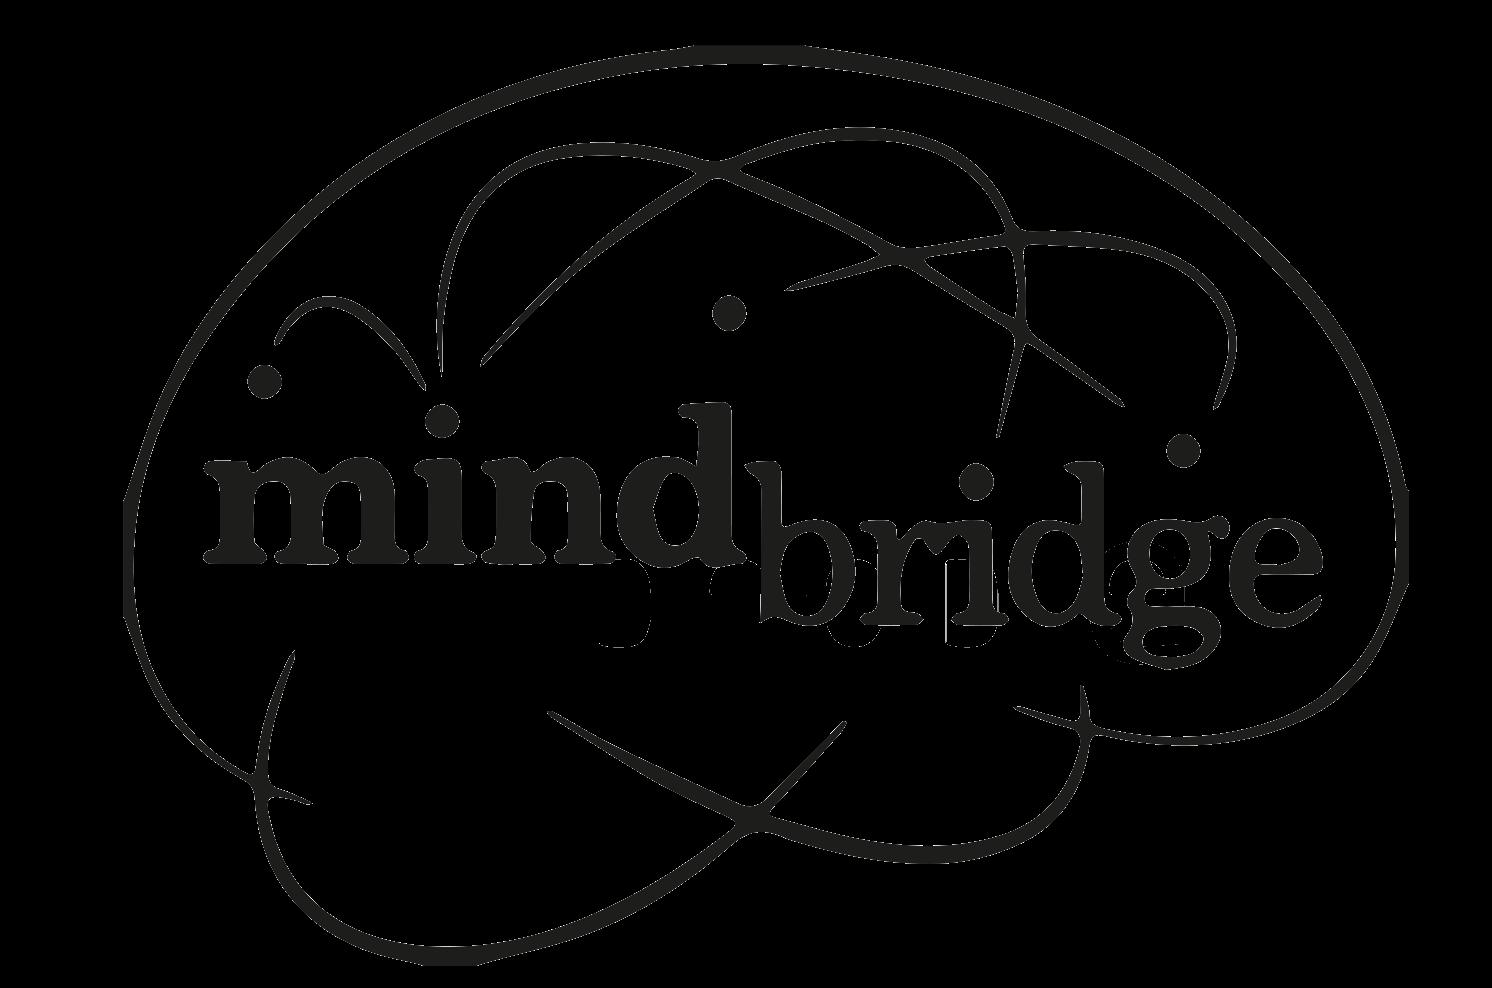 4.Mindbridge-Black.png